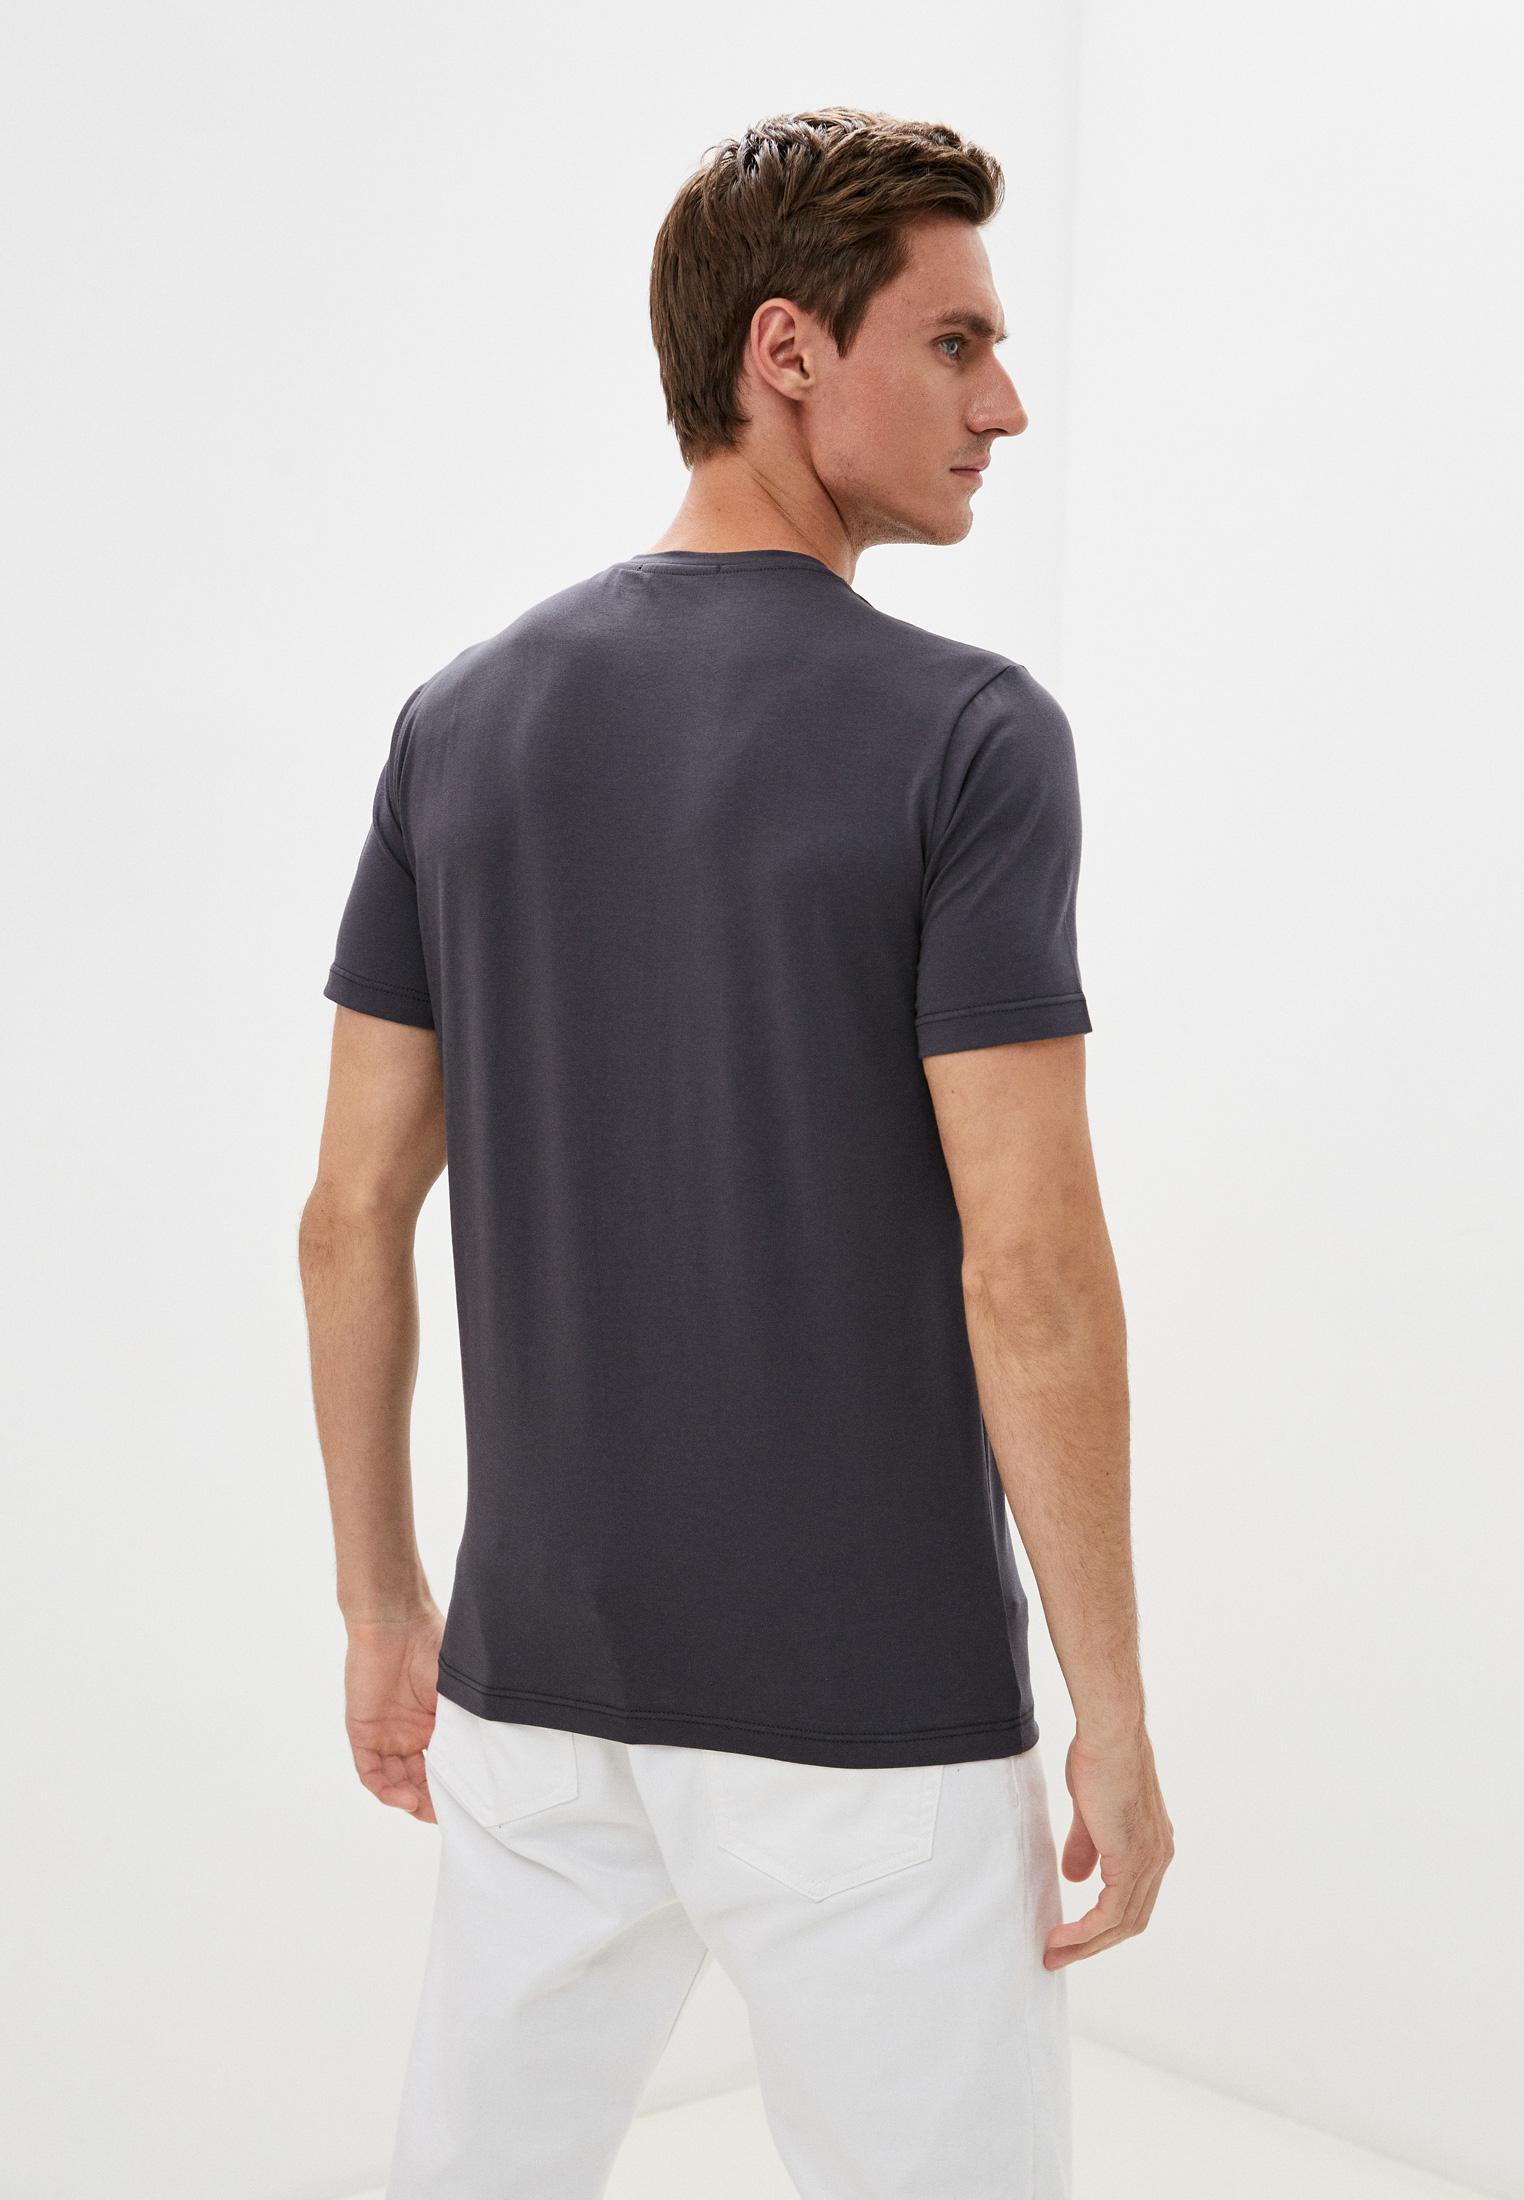 Мужская футболка Baldinini (Балдинини) TSU00: изображение 4